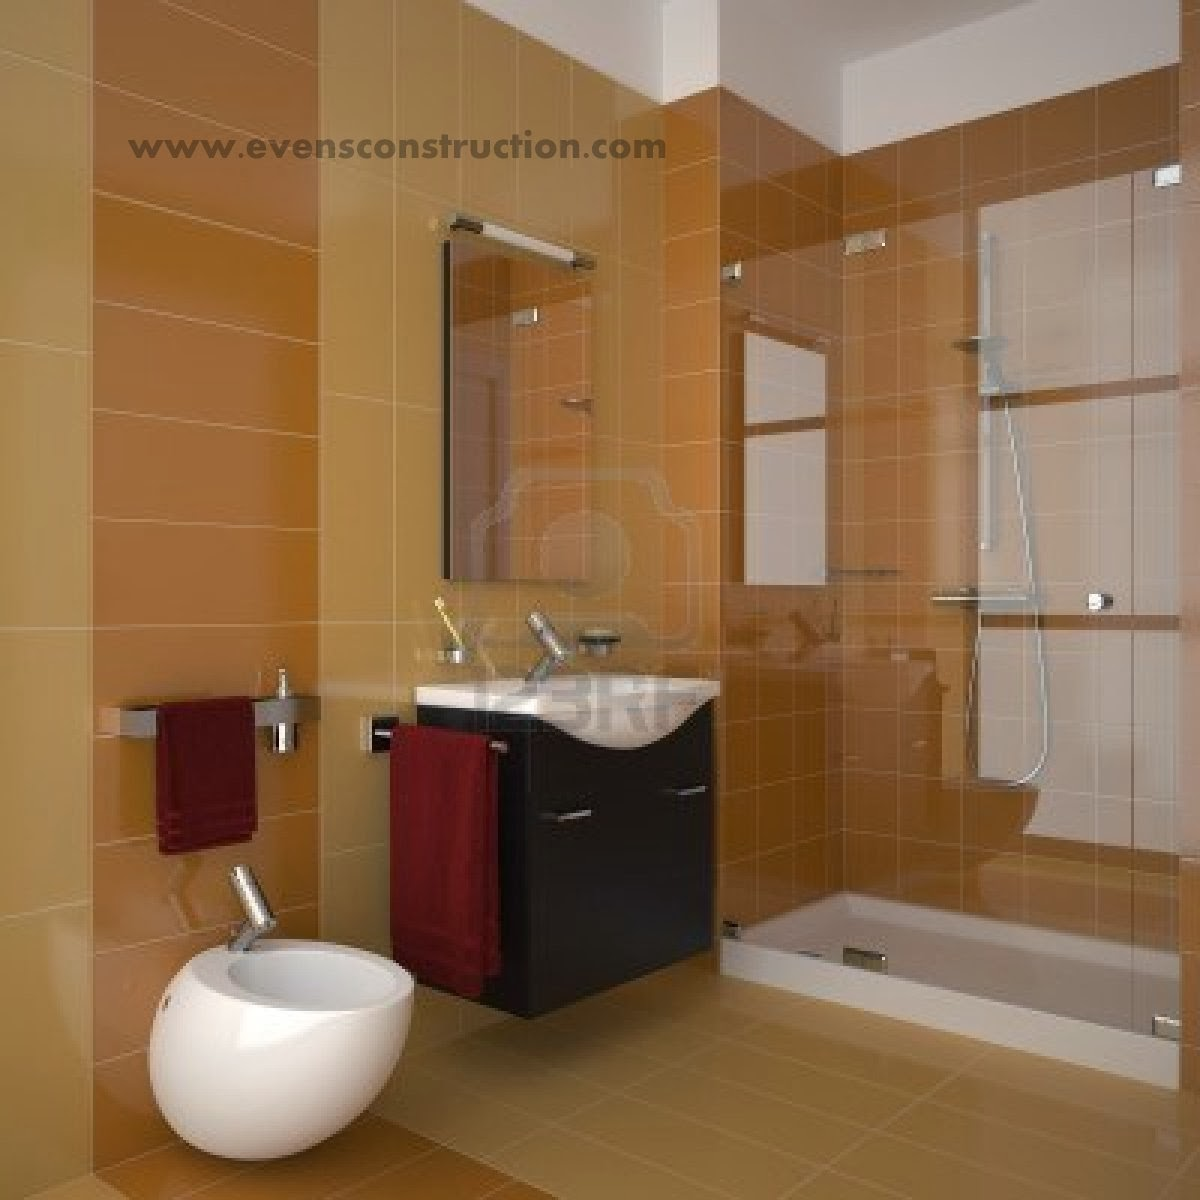 Traditional Contemporary Bathrooms Ltd: Evens Construction Pvt Ltd: Bathroom Tiles : Gallery